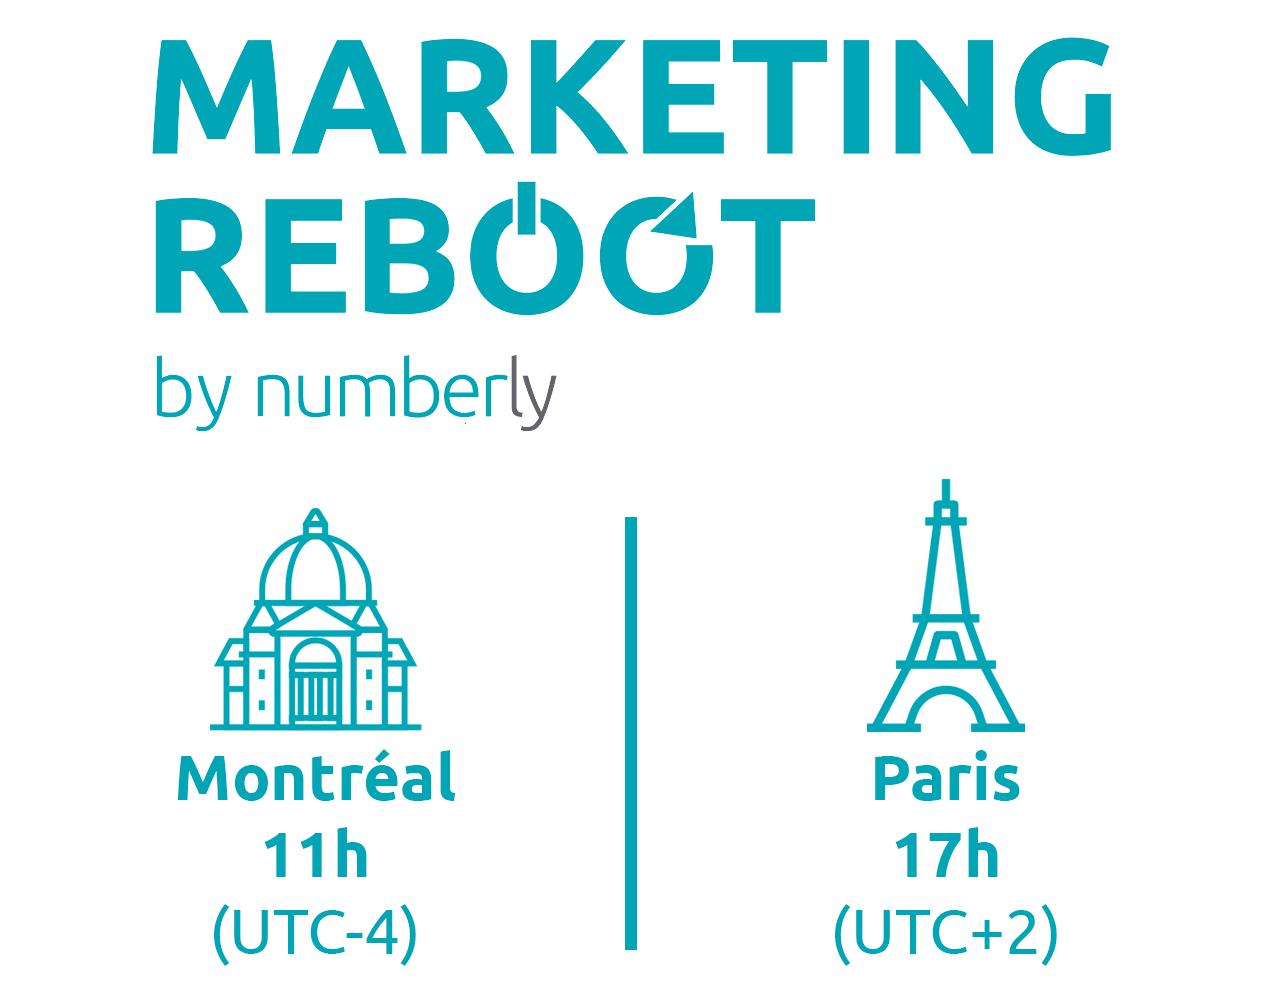 Marketing Reboot by Numberly : Montréal 11h | Paris 17h